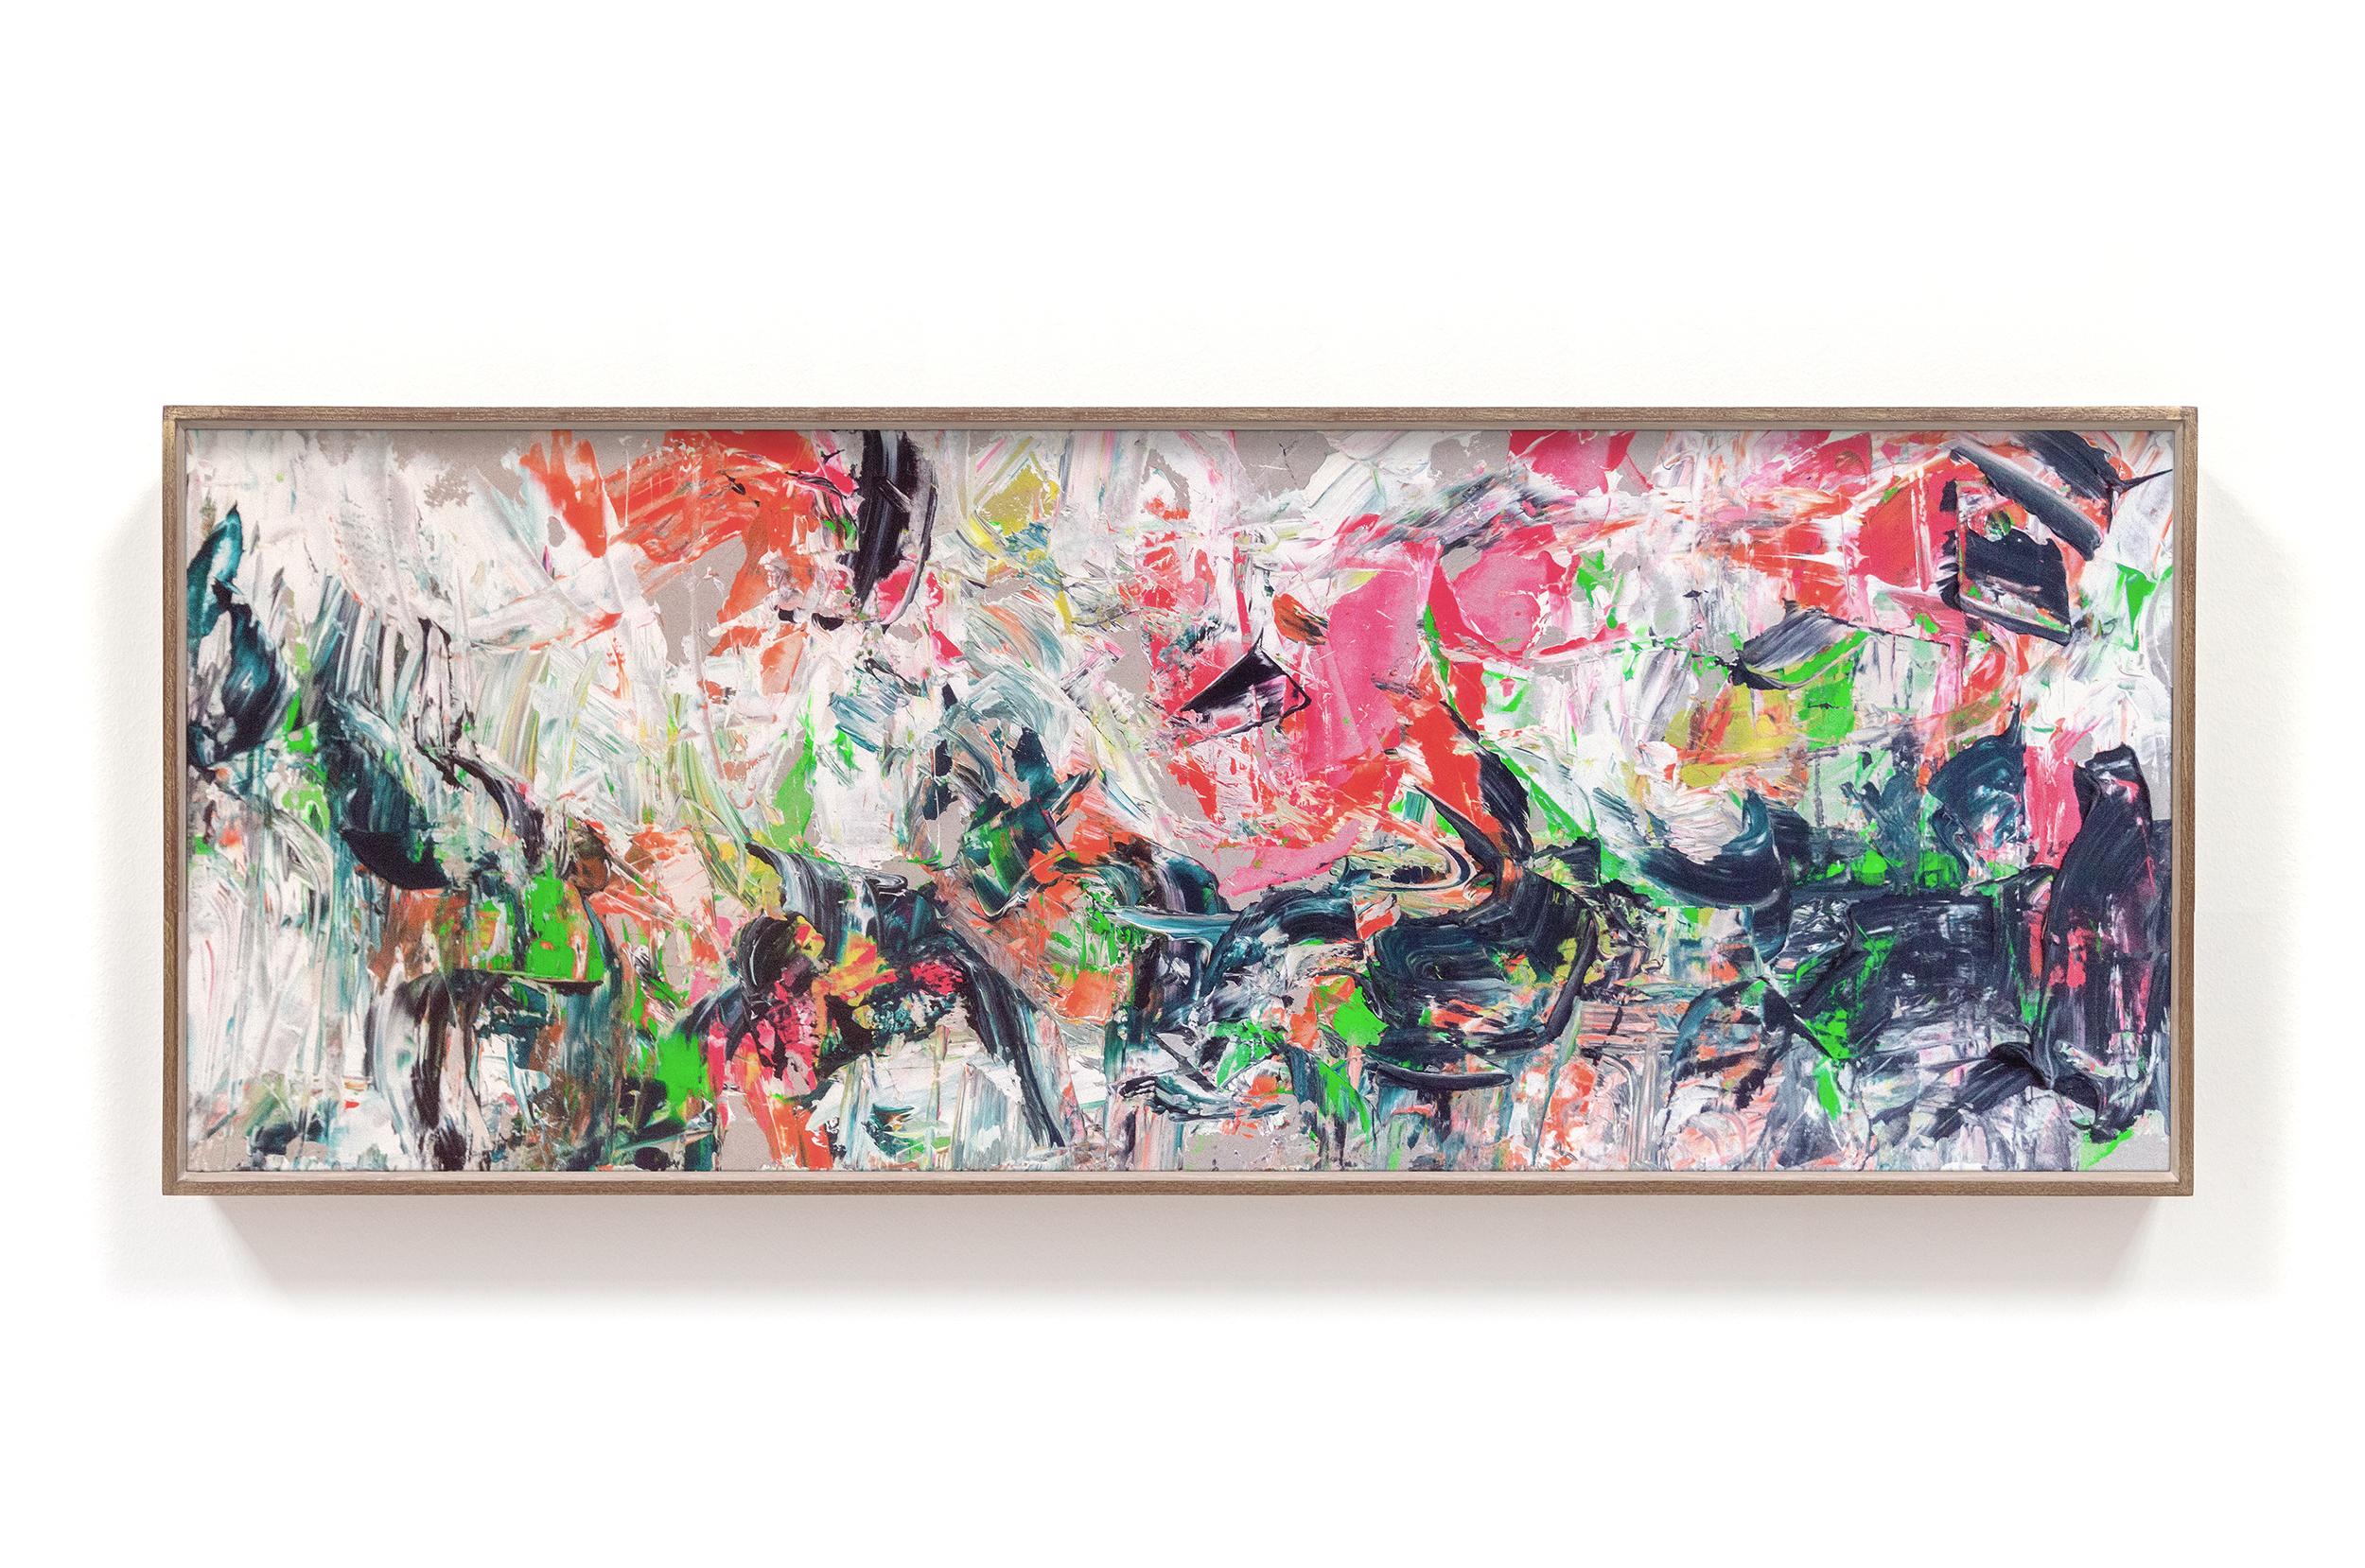 bonjourmolotov+Dogma+Illustration+Ilustracao+painting+pintura+acrylic+acrílico+canvas+tela+paper+cardboard+mdf+Andre+Gigante.jpg